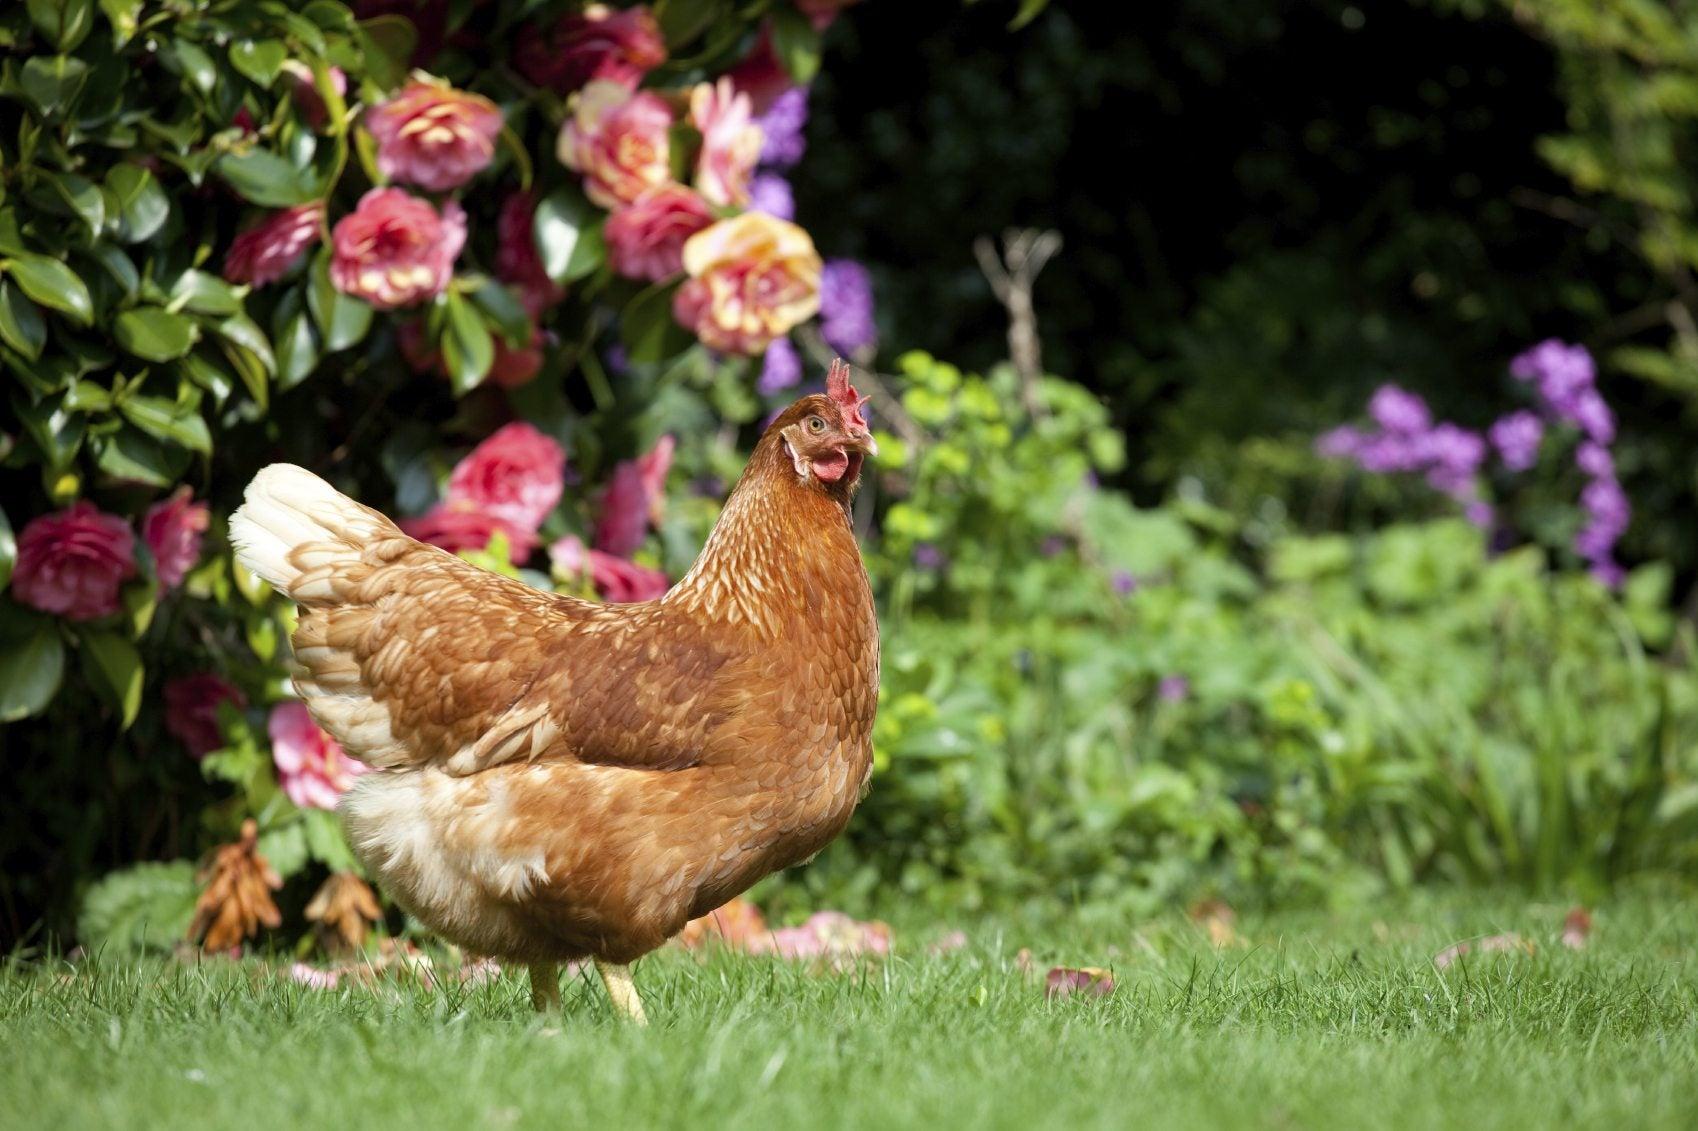 triyae com u003d backyard chickens for beginners various design